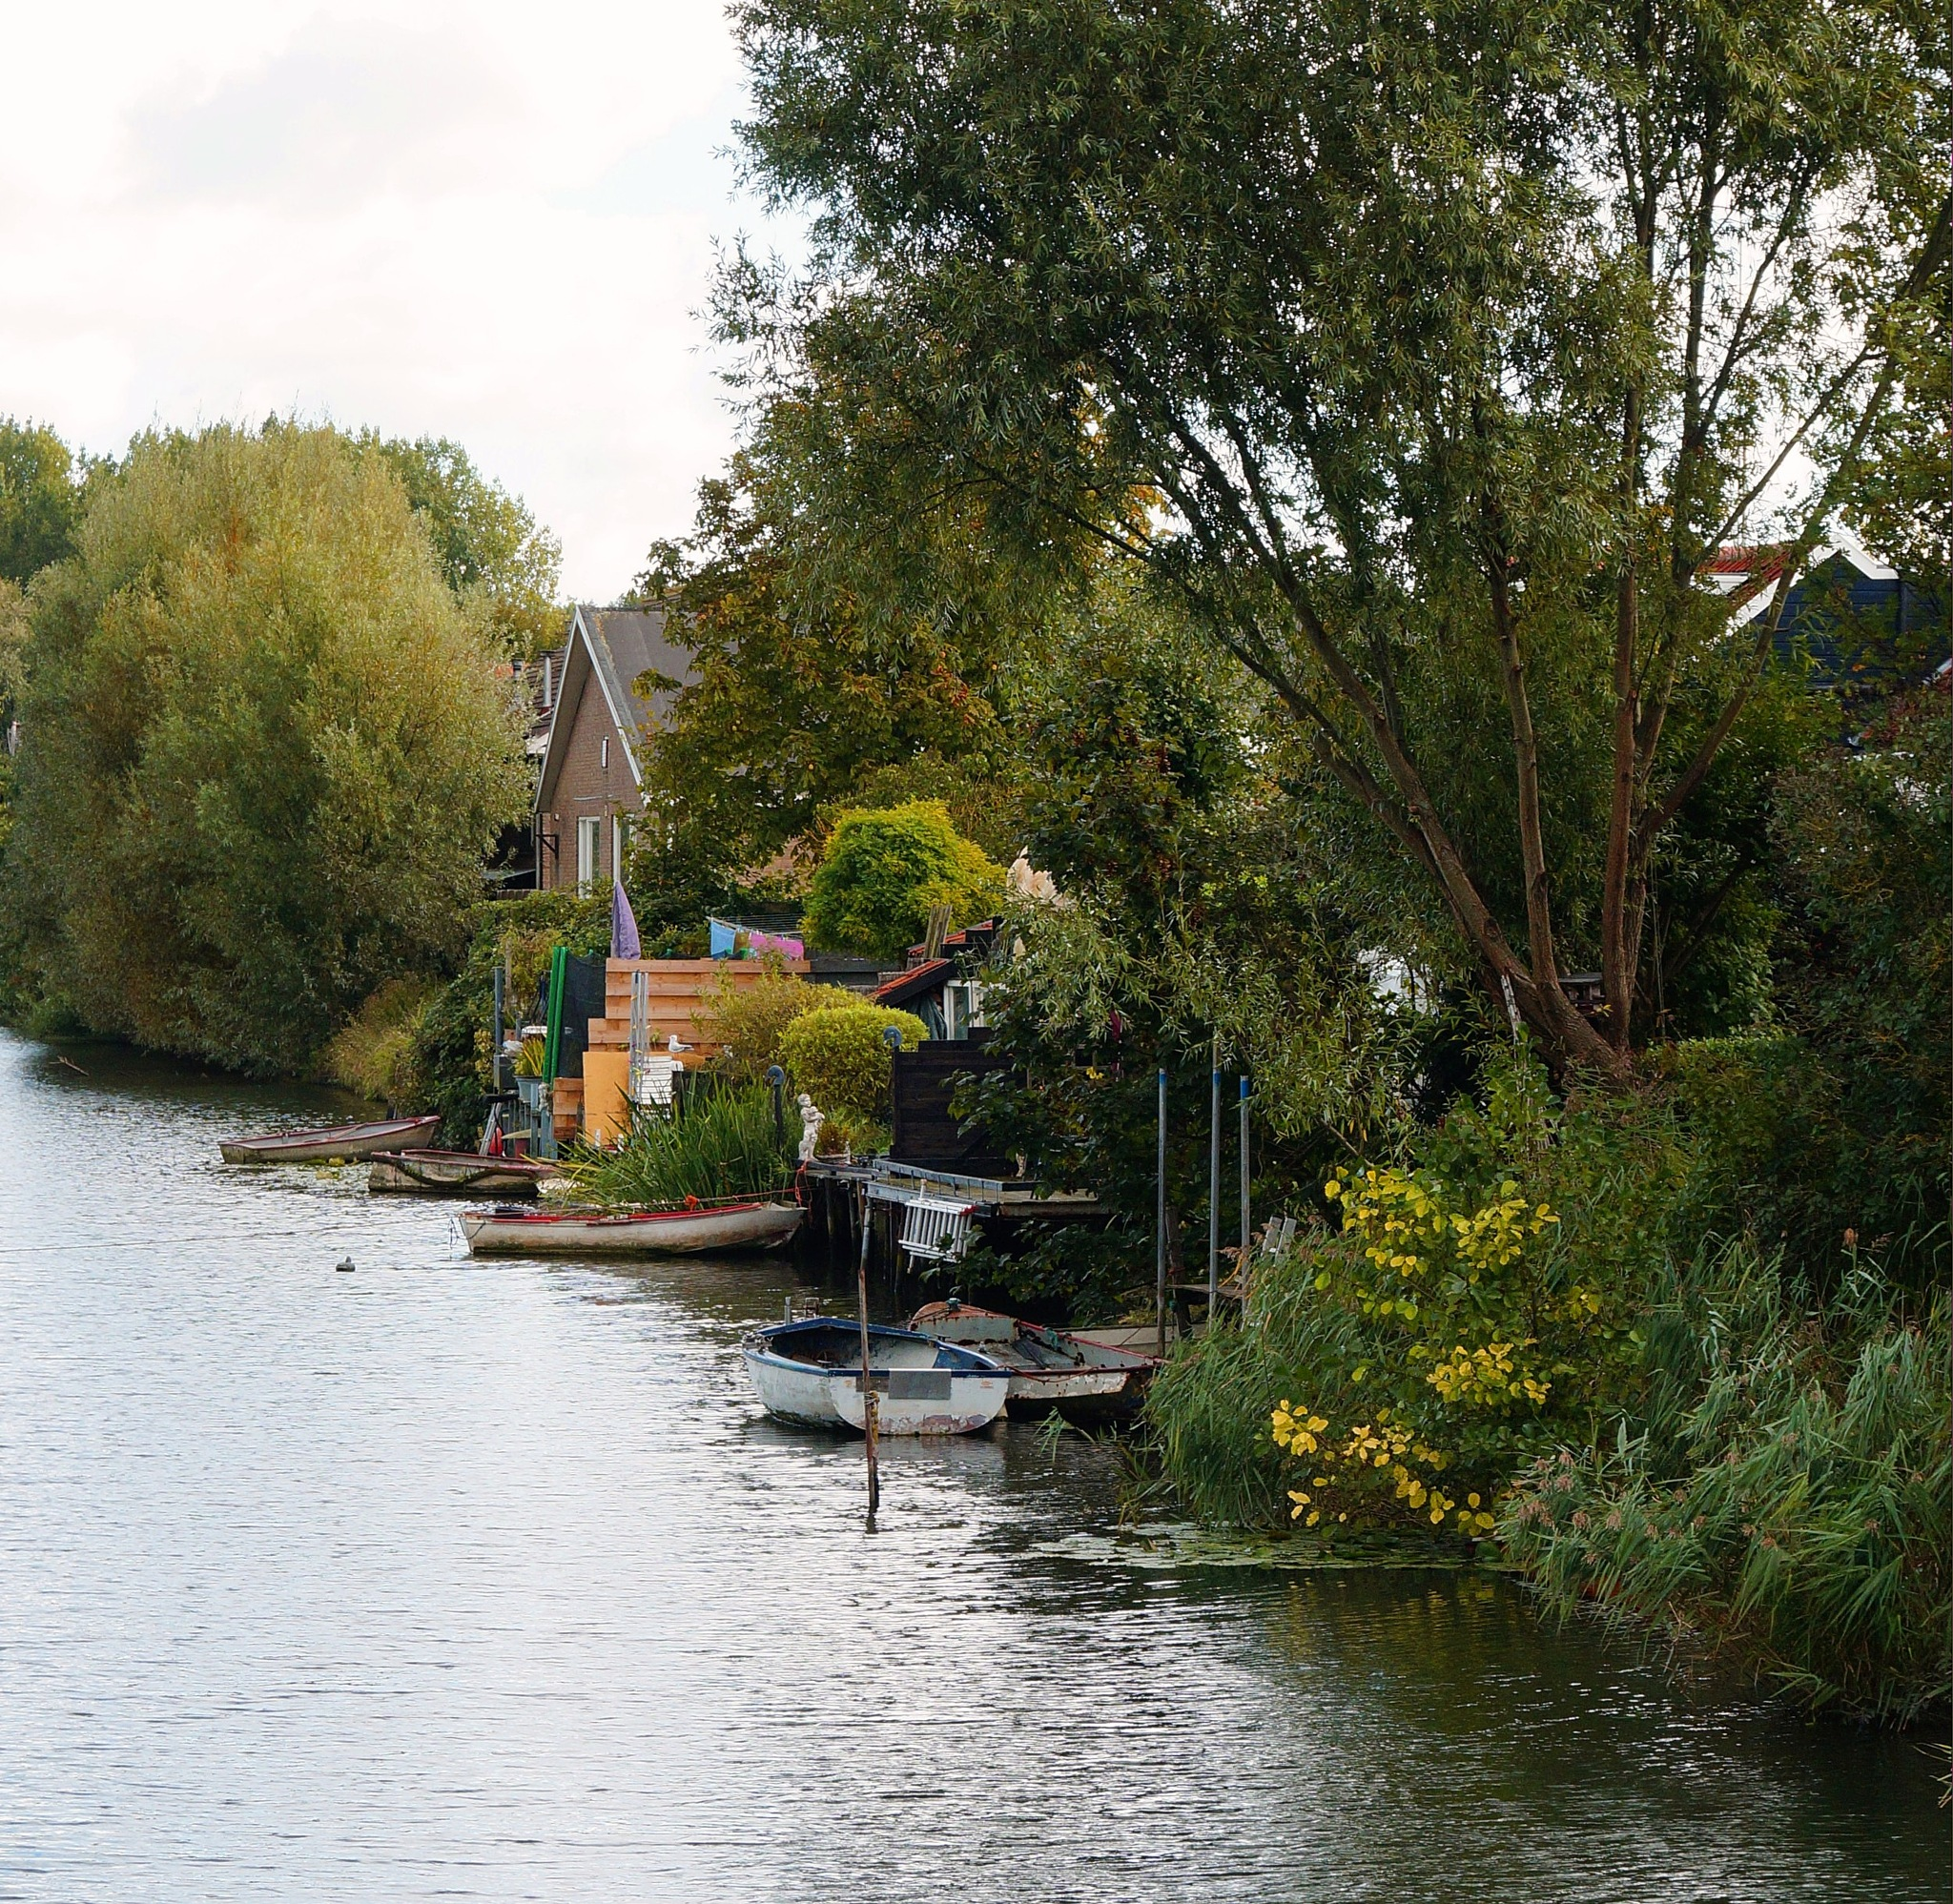 Alongside the Canal by Marian Baay